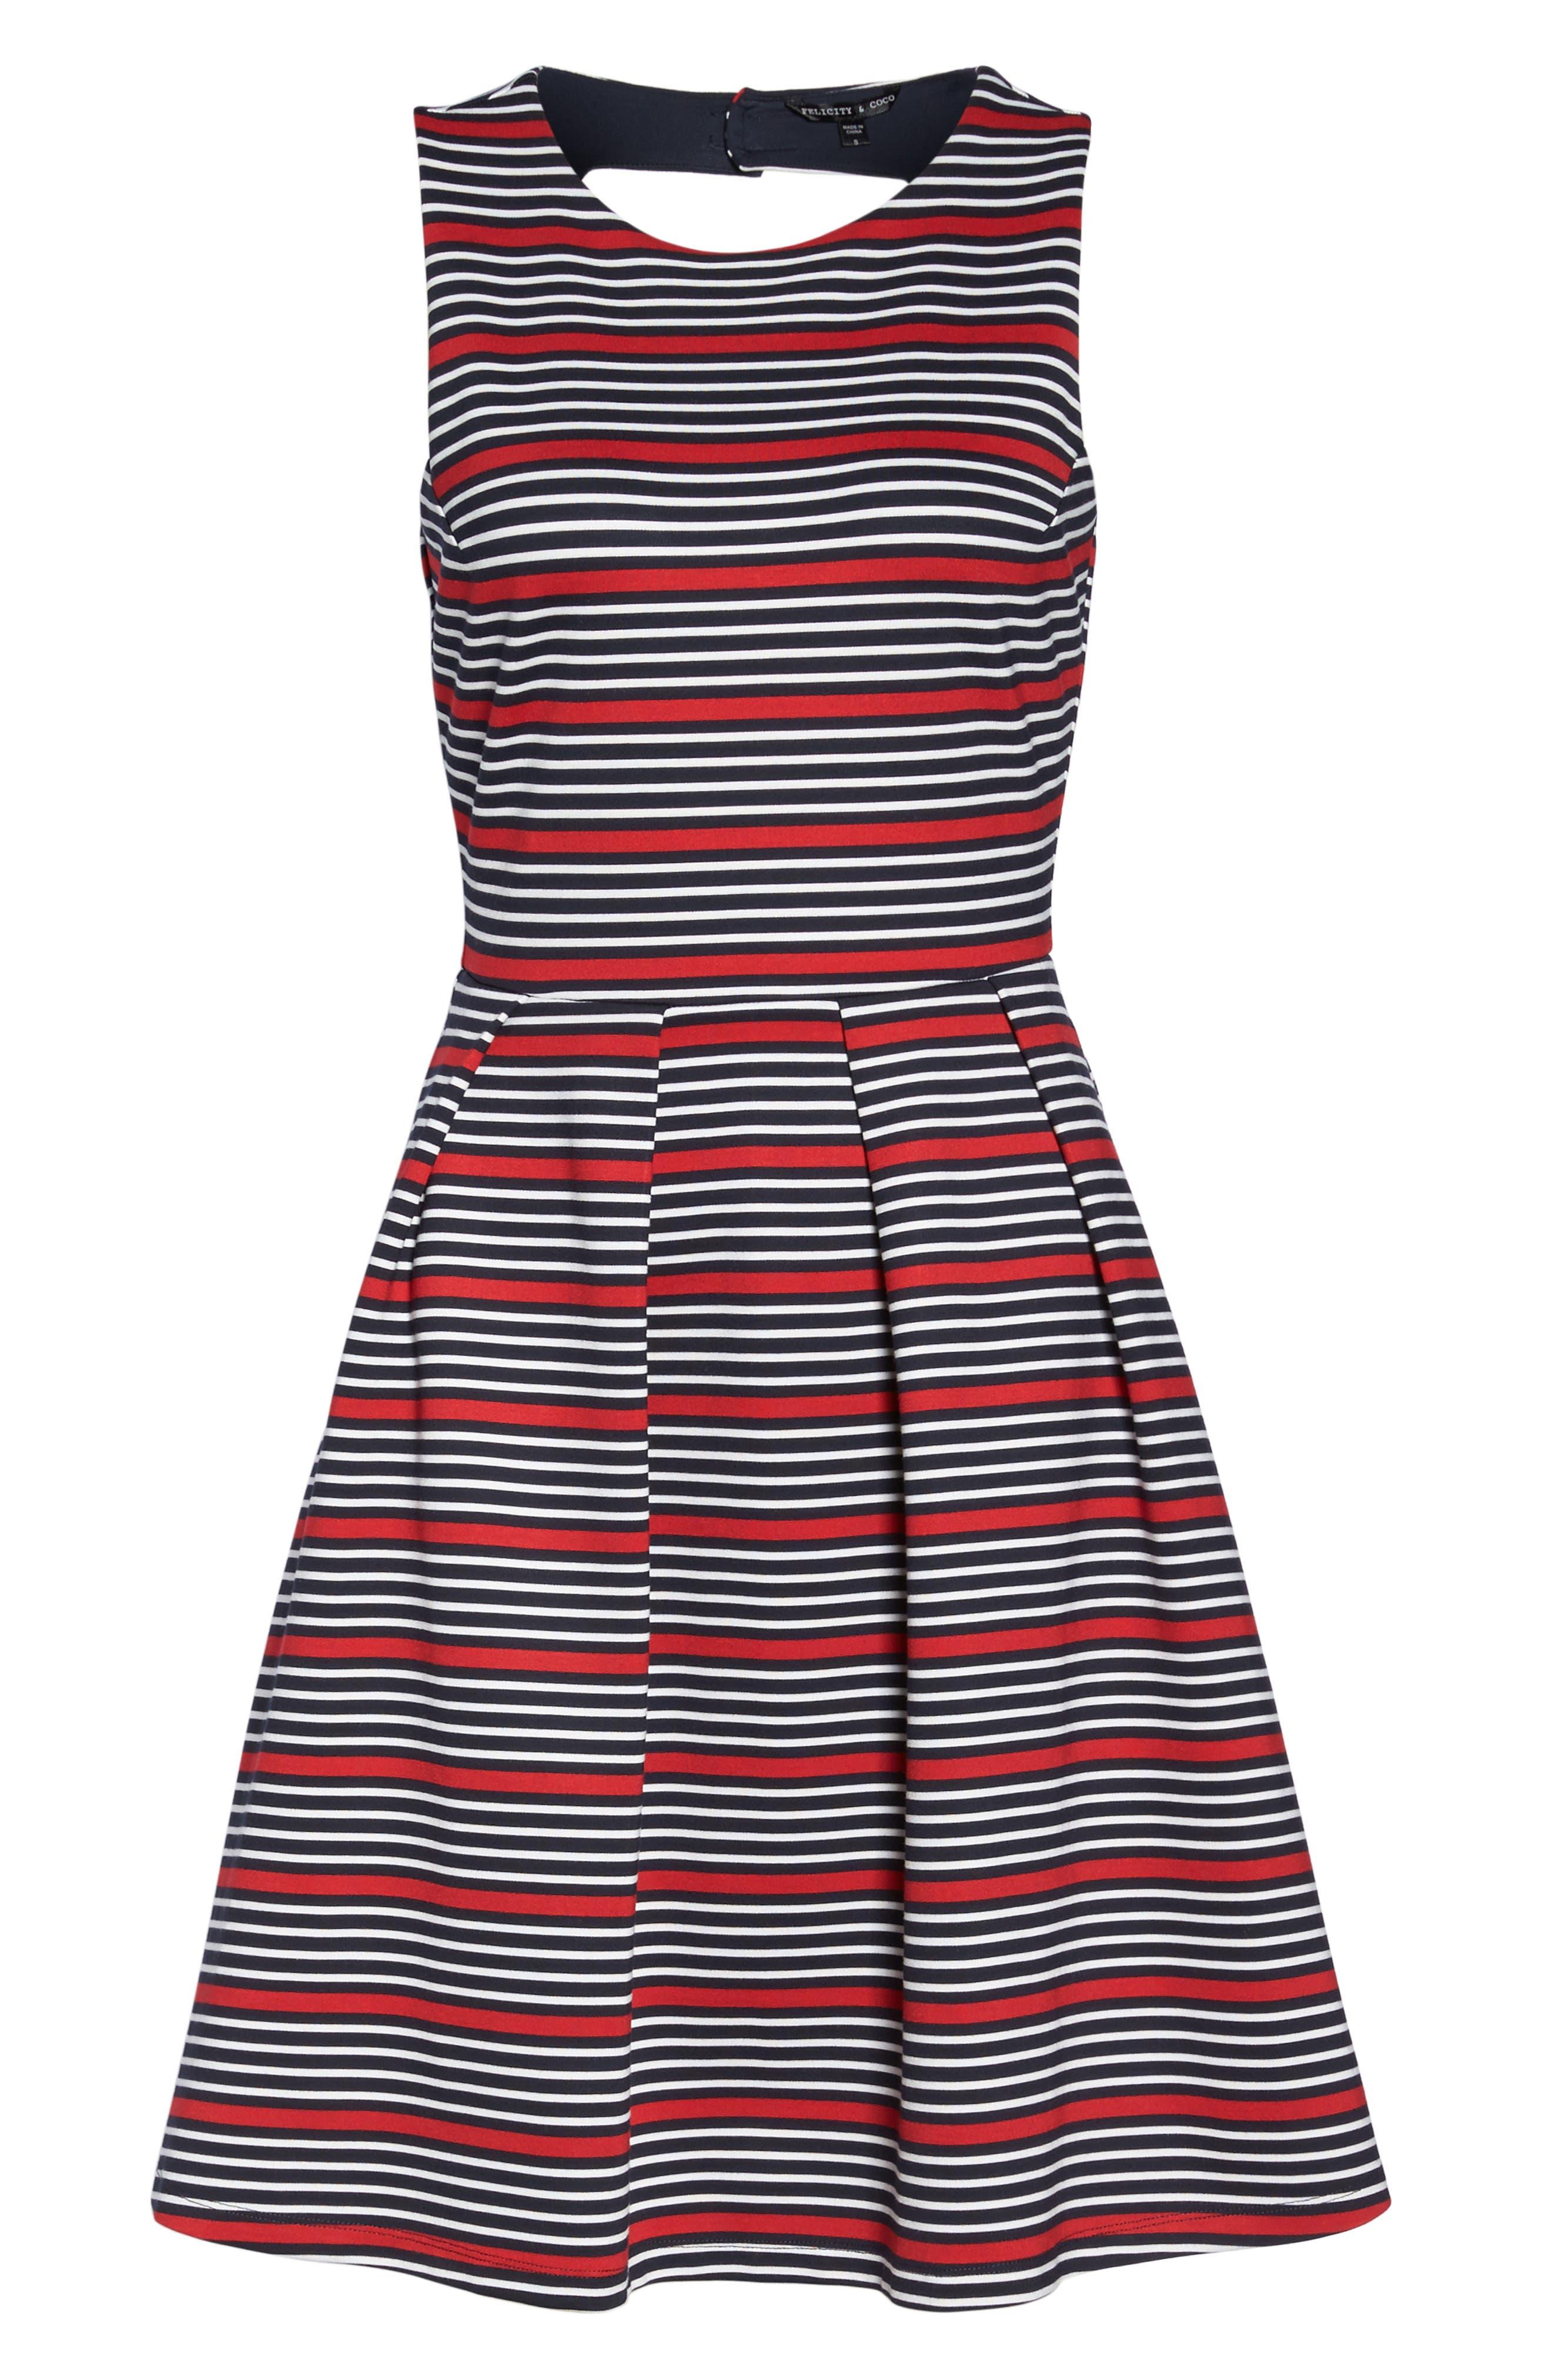 Scarlette Stripe Fit & Flare Dress,                             Alternate thumbnail 6, color,                             Navy/ Red/ White Stripe